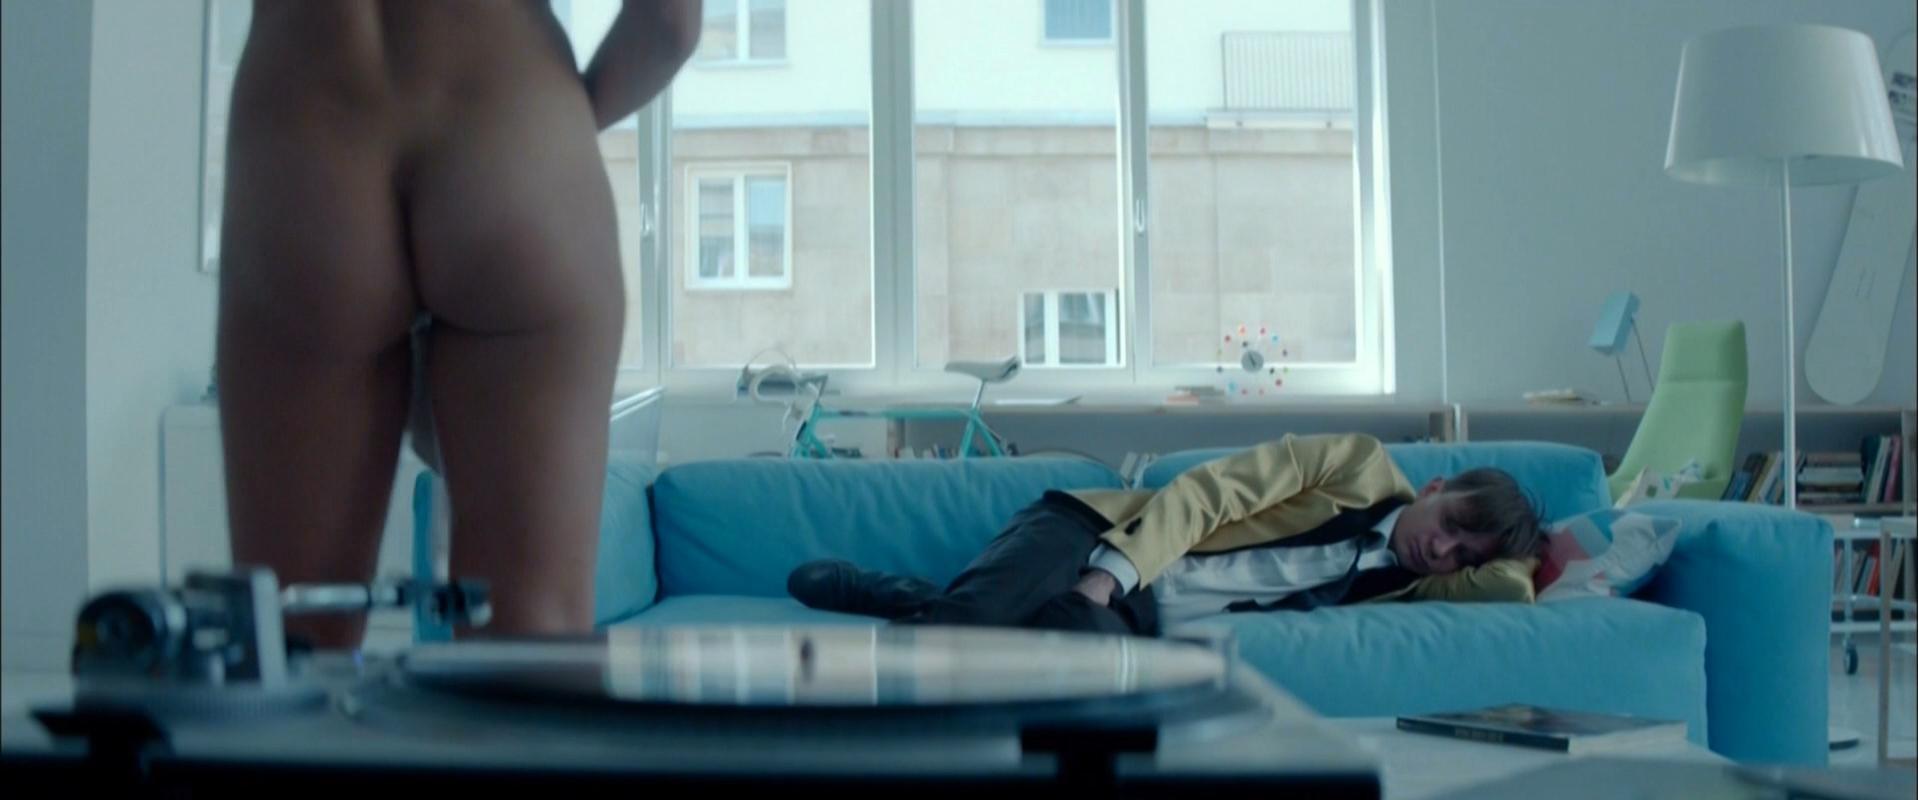 Aleksandra Wojtysiak nude - Cale mnostwo milosci (2014)